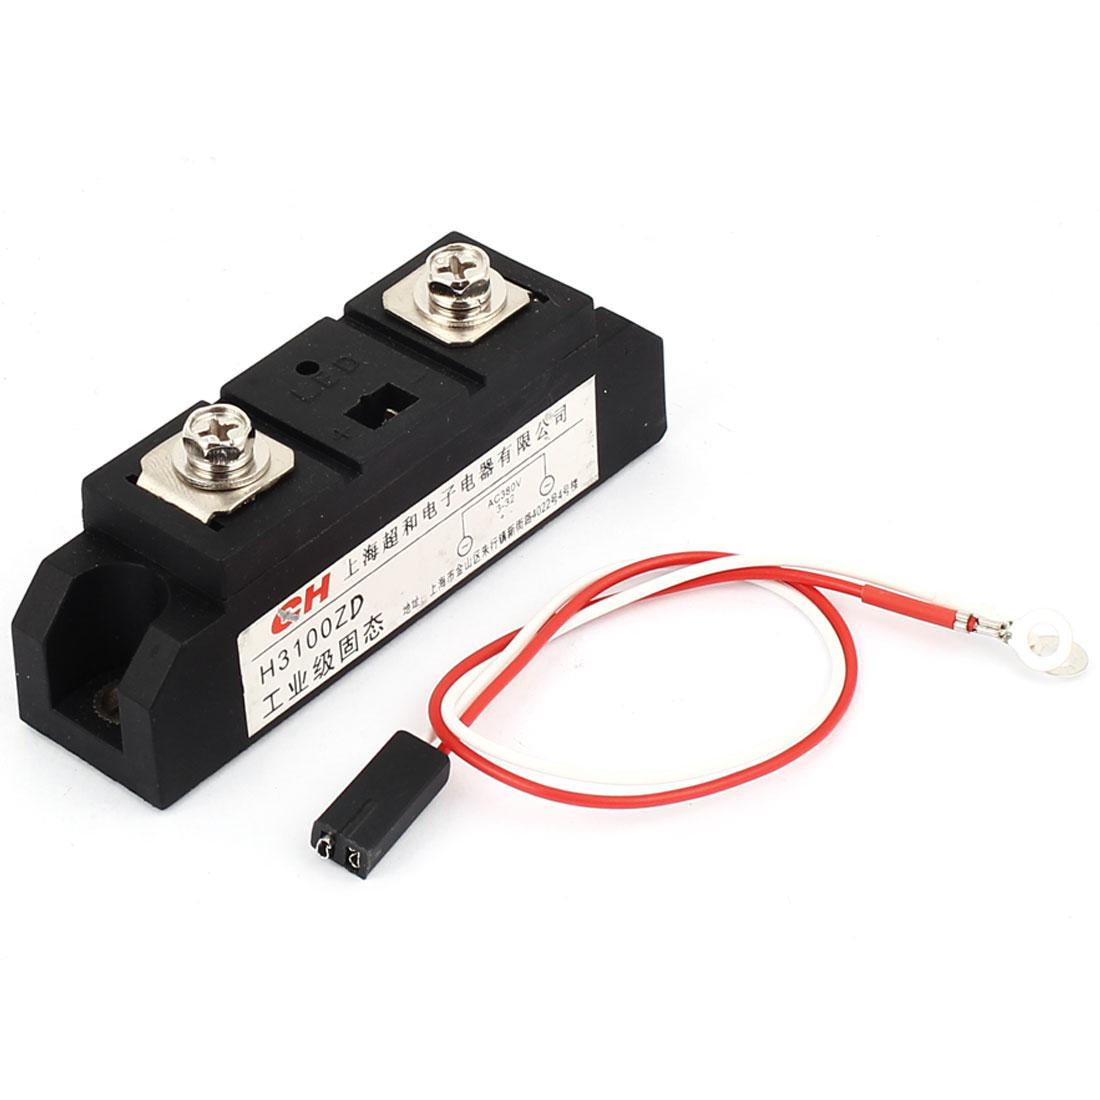 H3100Z SSR AC-AC 3-32VDC to 380VAC 100A w Wire Solid State Relay